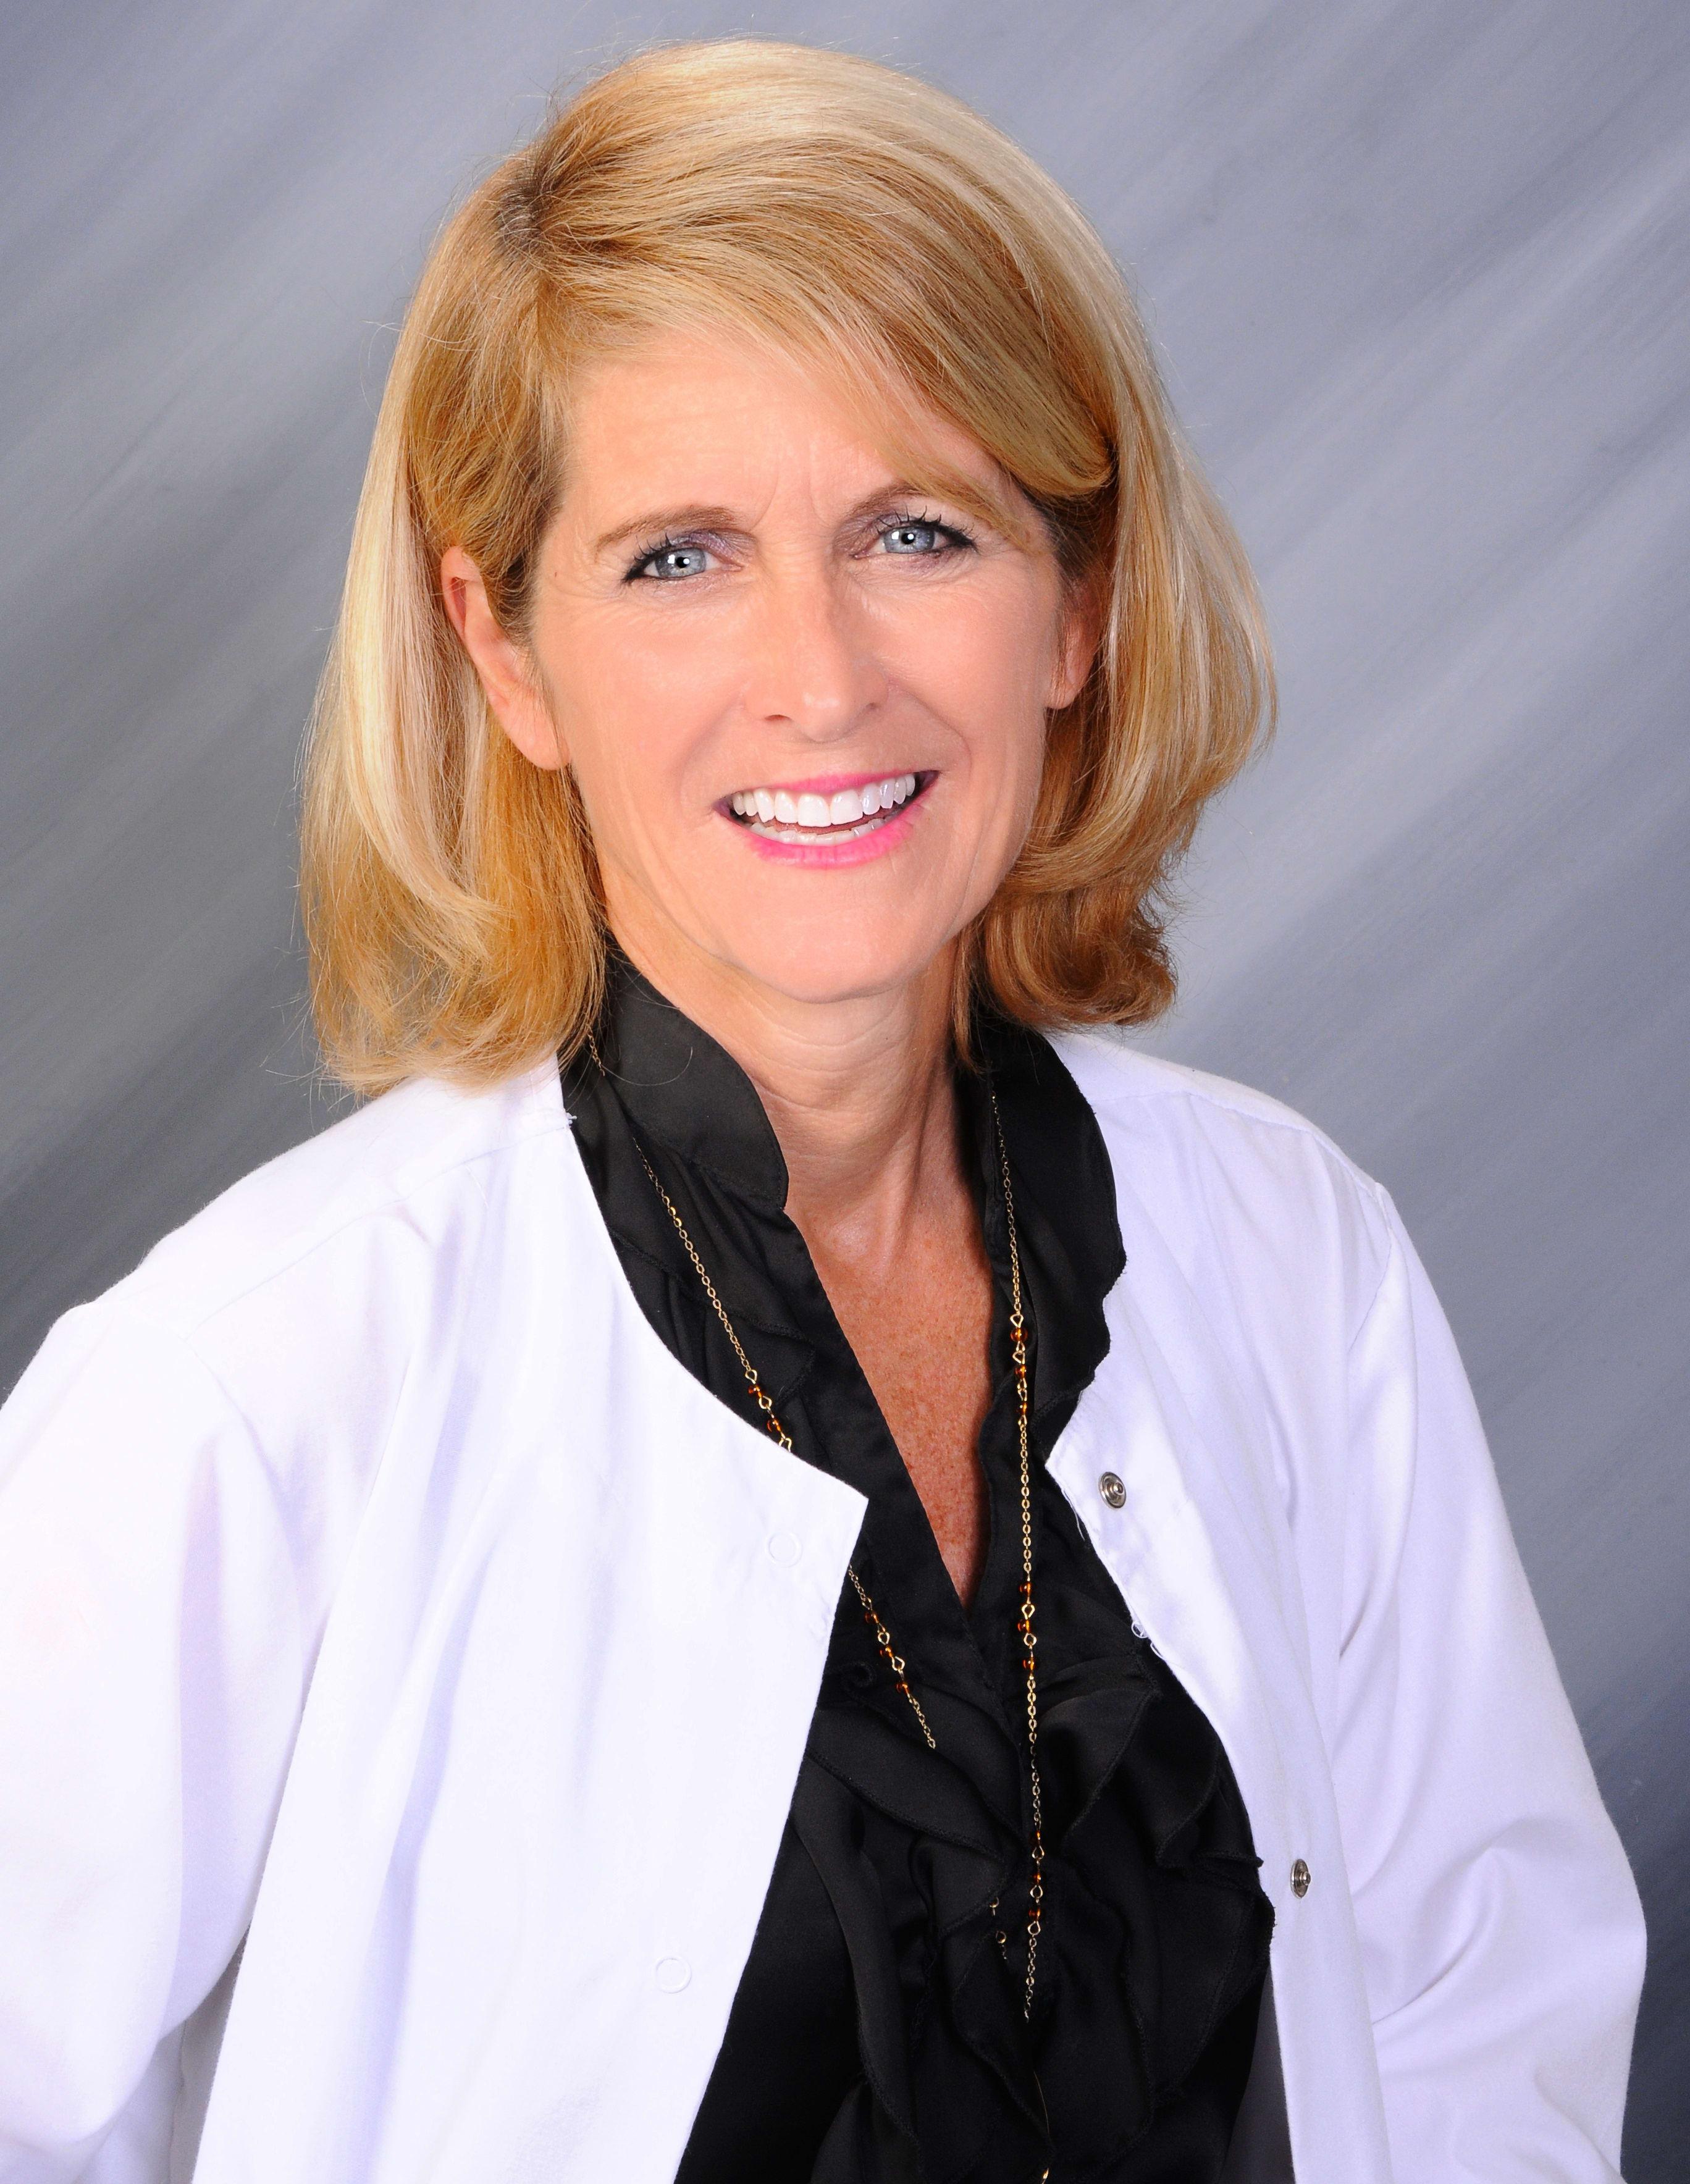 Leslie K Bonar, DDS General Dentistry